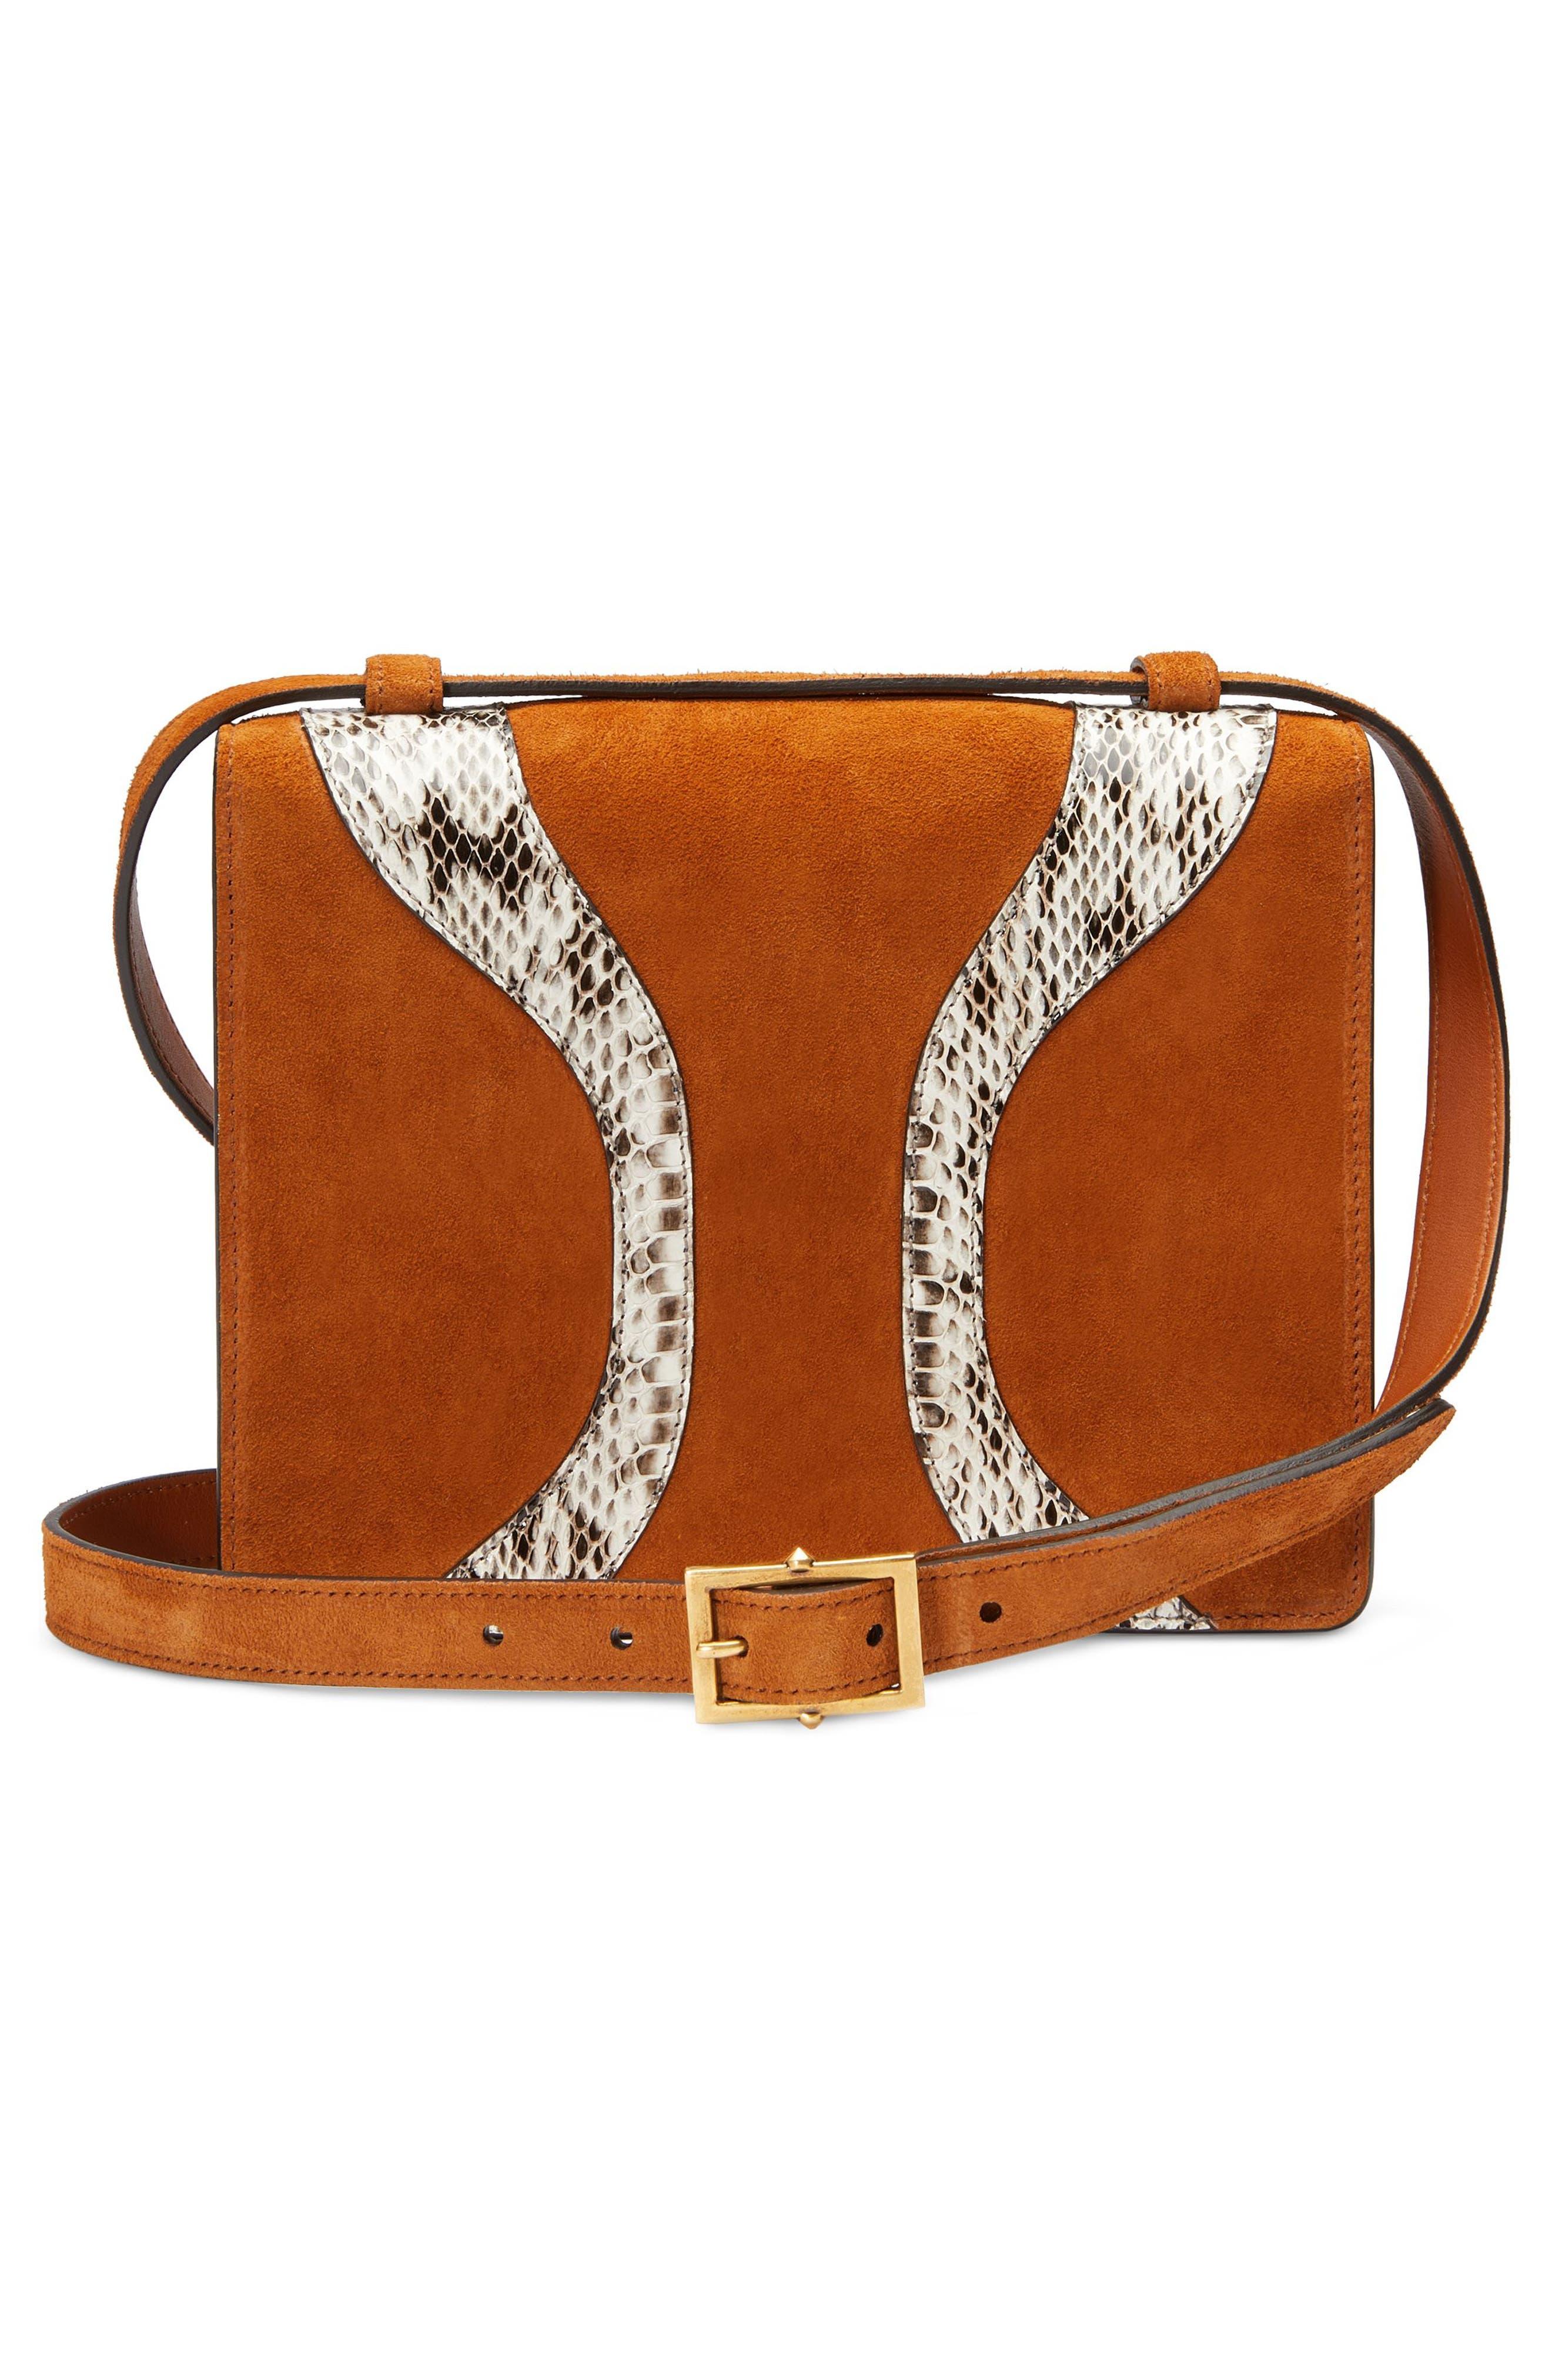 Osiride Suede & Genuine Snakeskin Shoulder Bag,                             Alternate thumbnail 2, color,                             Bright Cuir/ Roccia